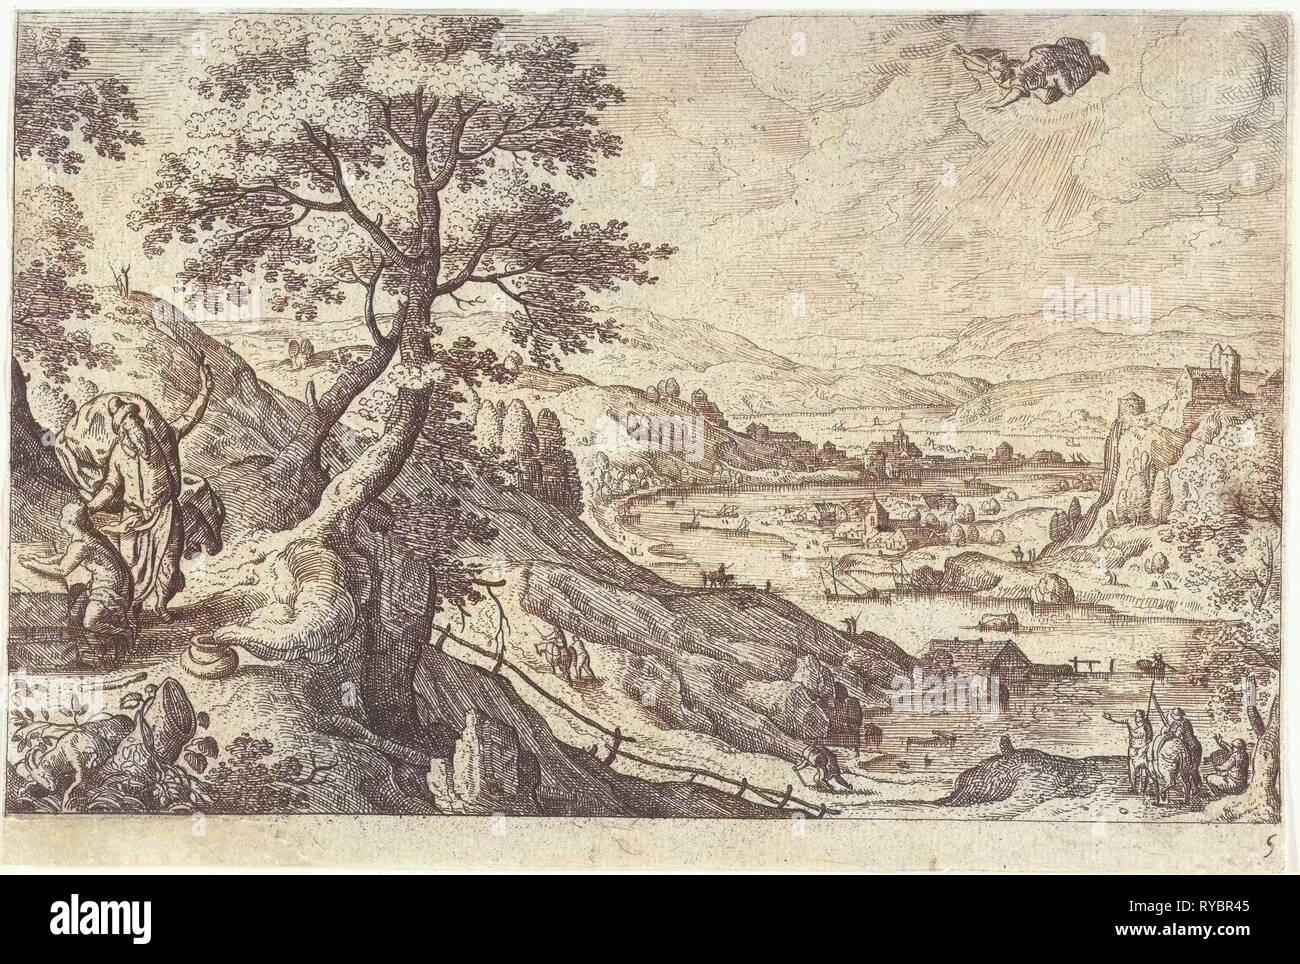 Sacrifice of Isaac, Hans Bol, Anonymous, c. 1550 - c. 1650 - Stock Image